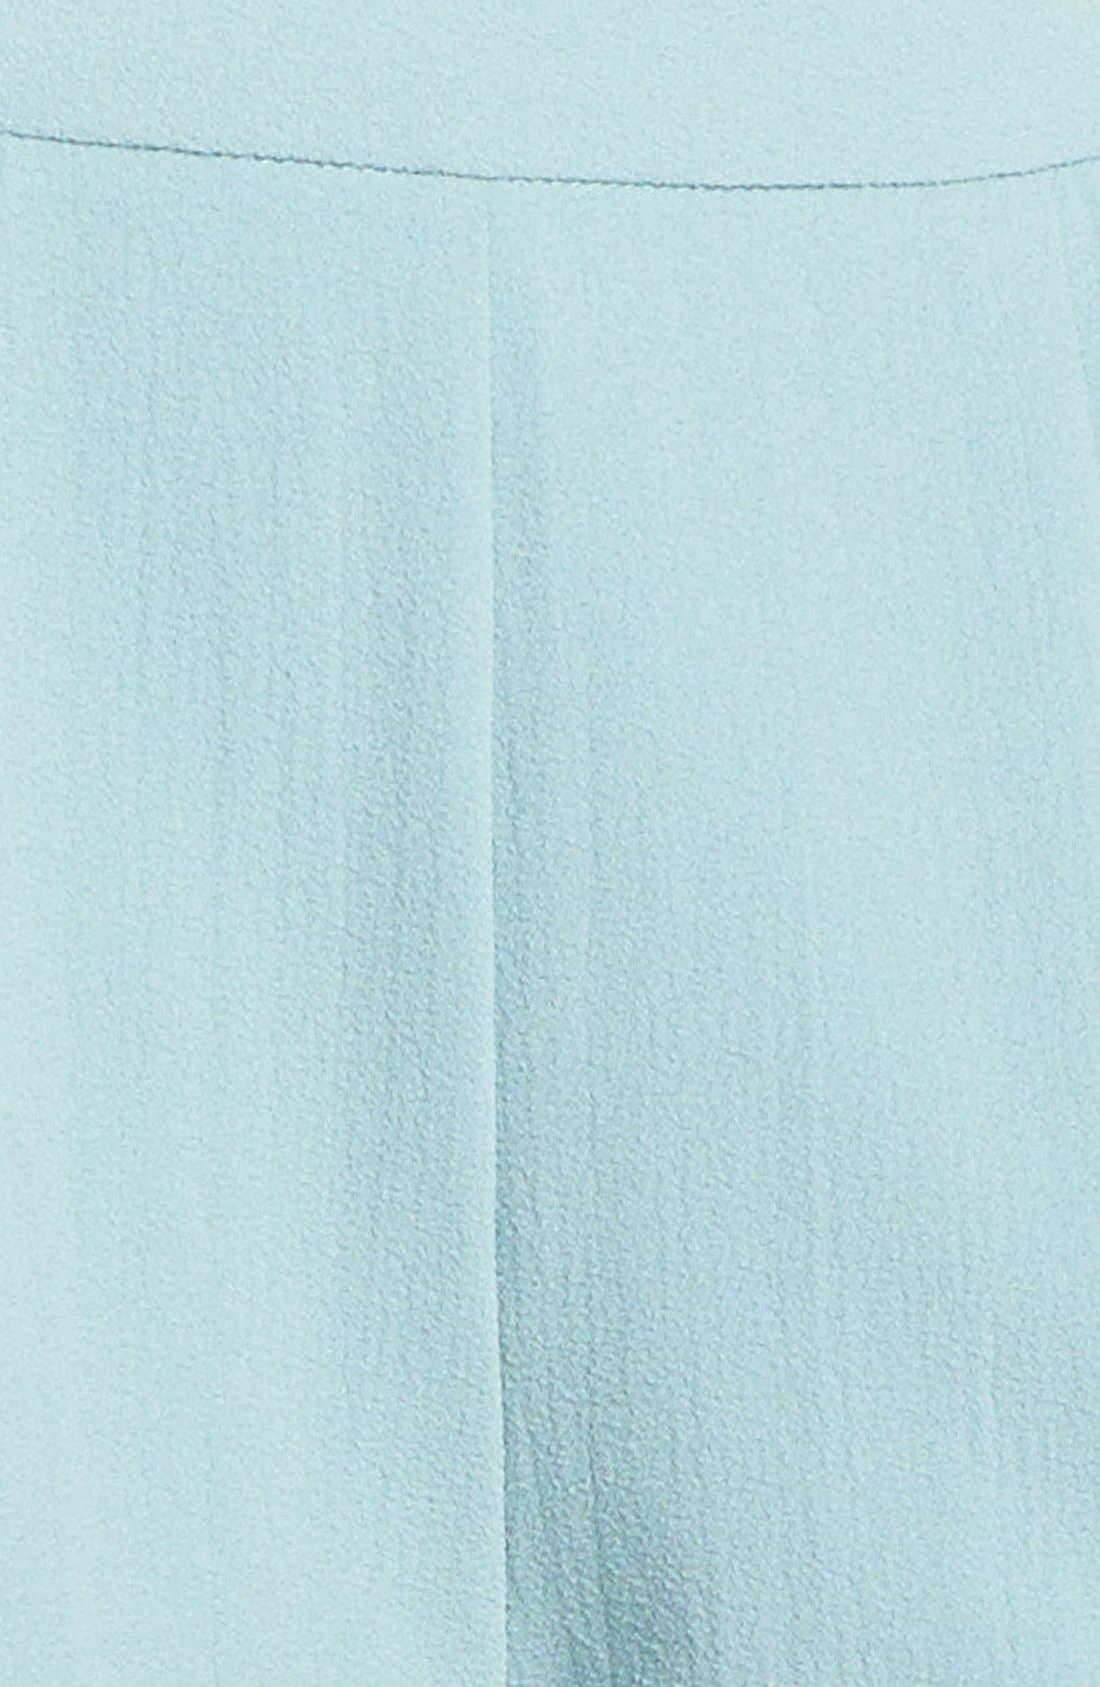 Scalloped Lace Shorts,                             Alternate thumbnail 2, color,                             400